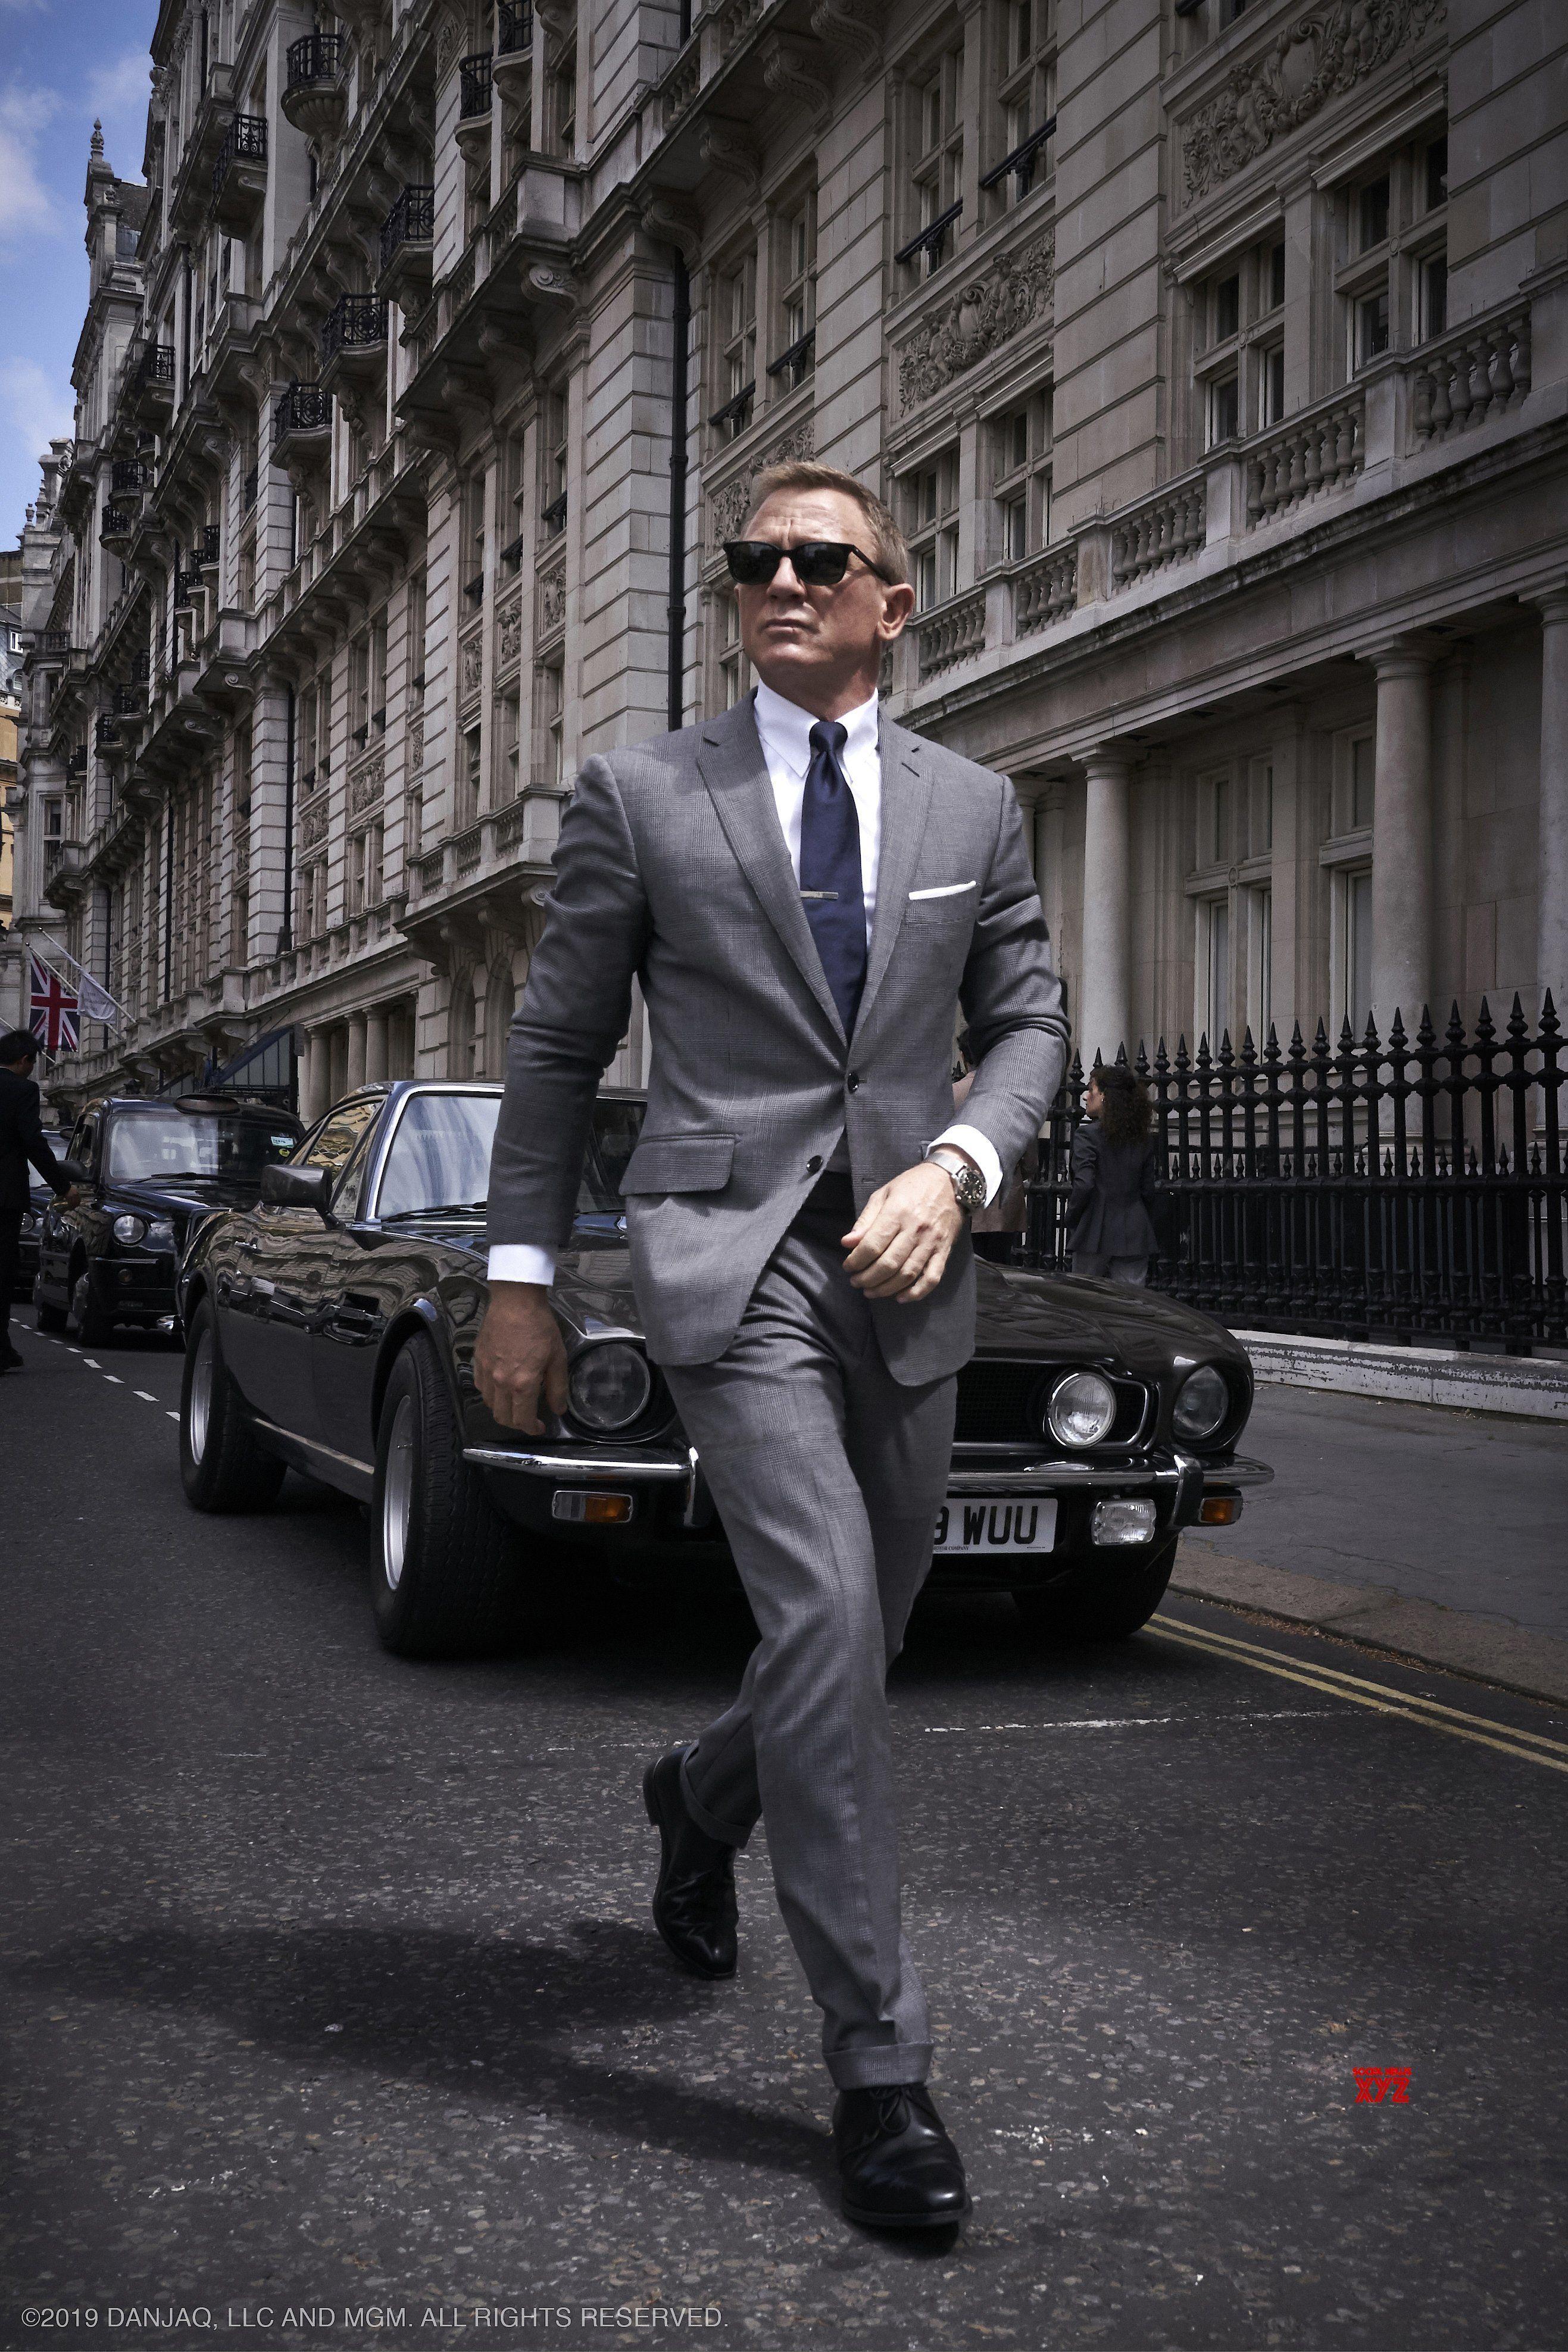 James Bond Daniel Craig Skyfall Film Film Agent 007 Romans Affiche London Homme